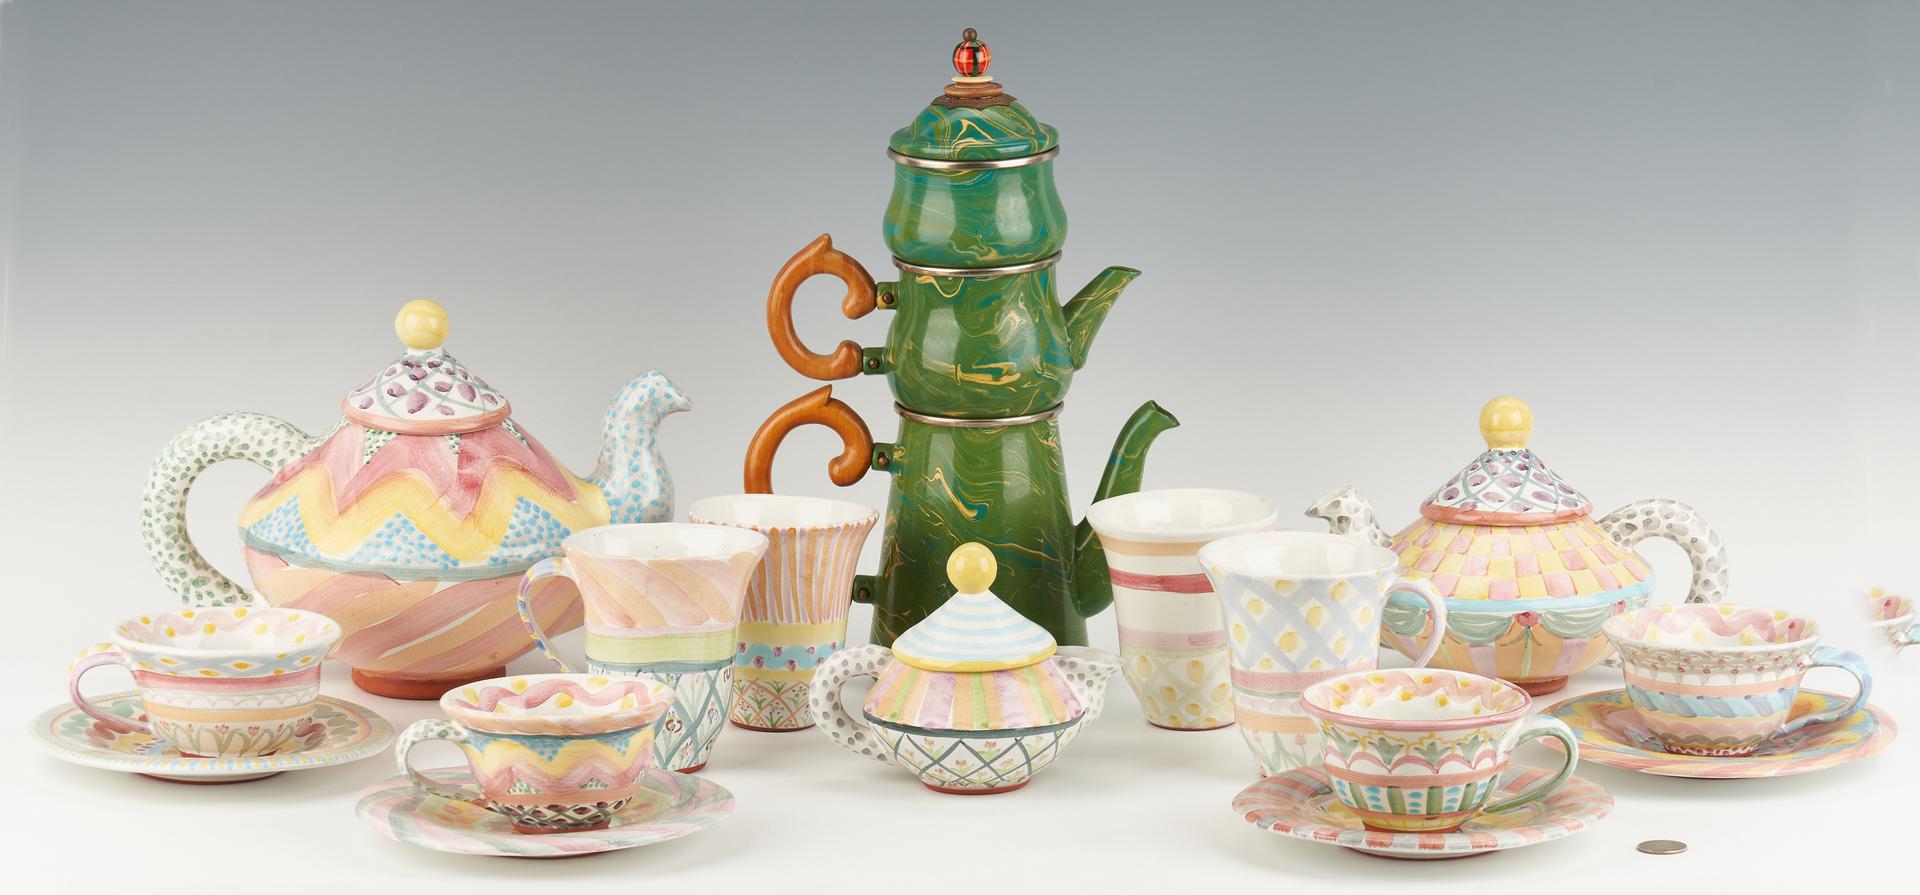 Lot 894: 18 Pcs. MacKenzie-Childs Ceramic & Enamel Ware